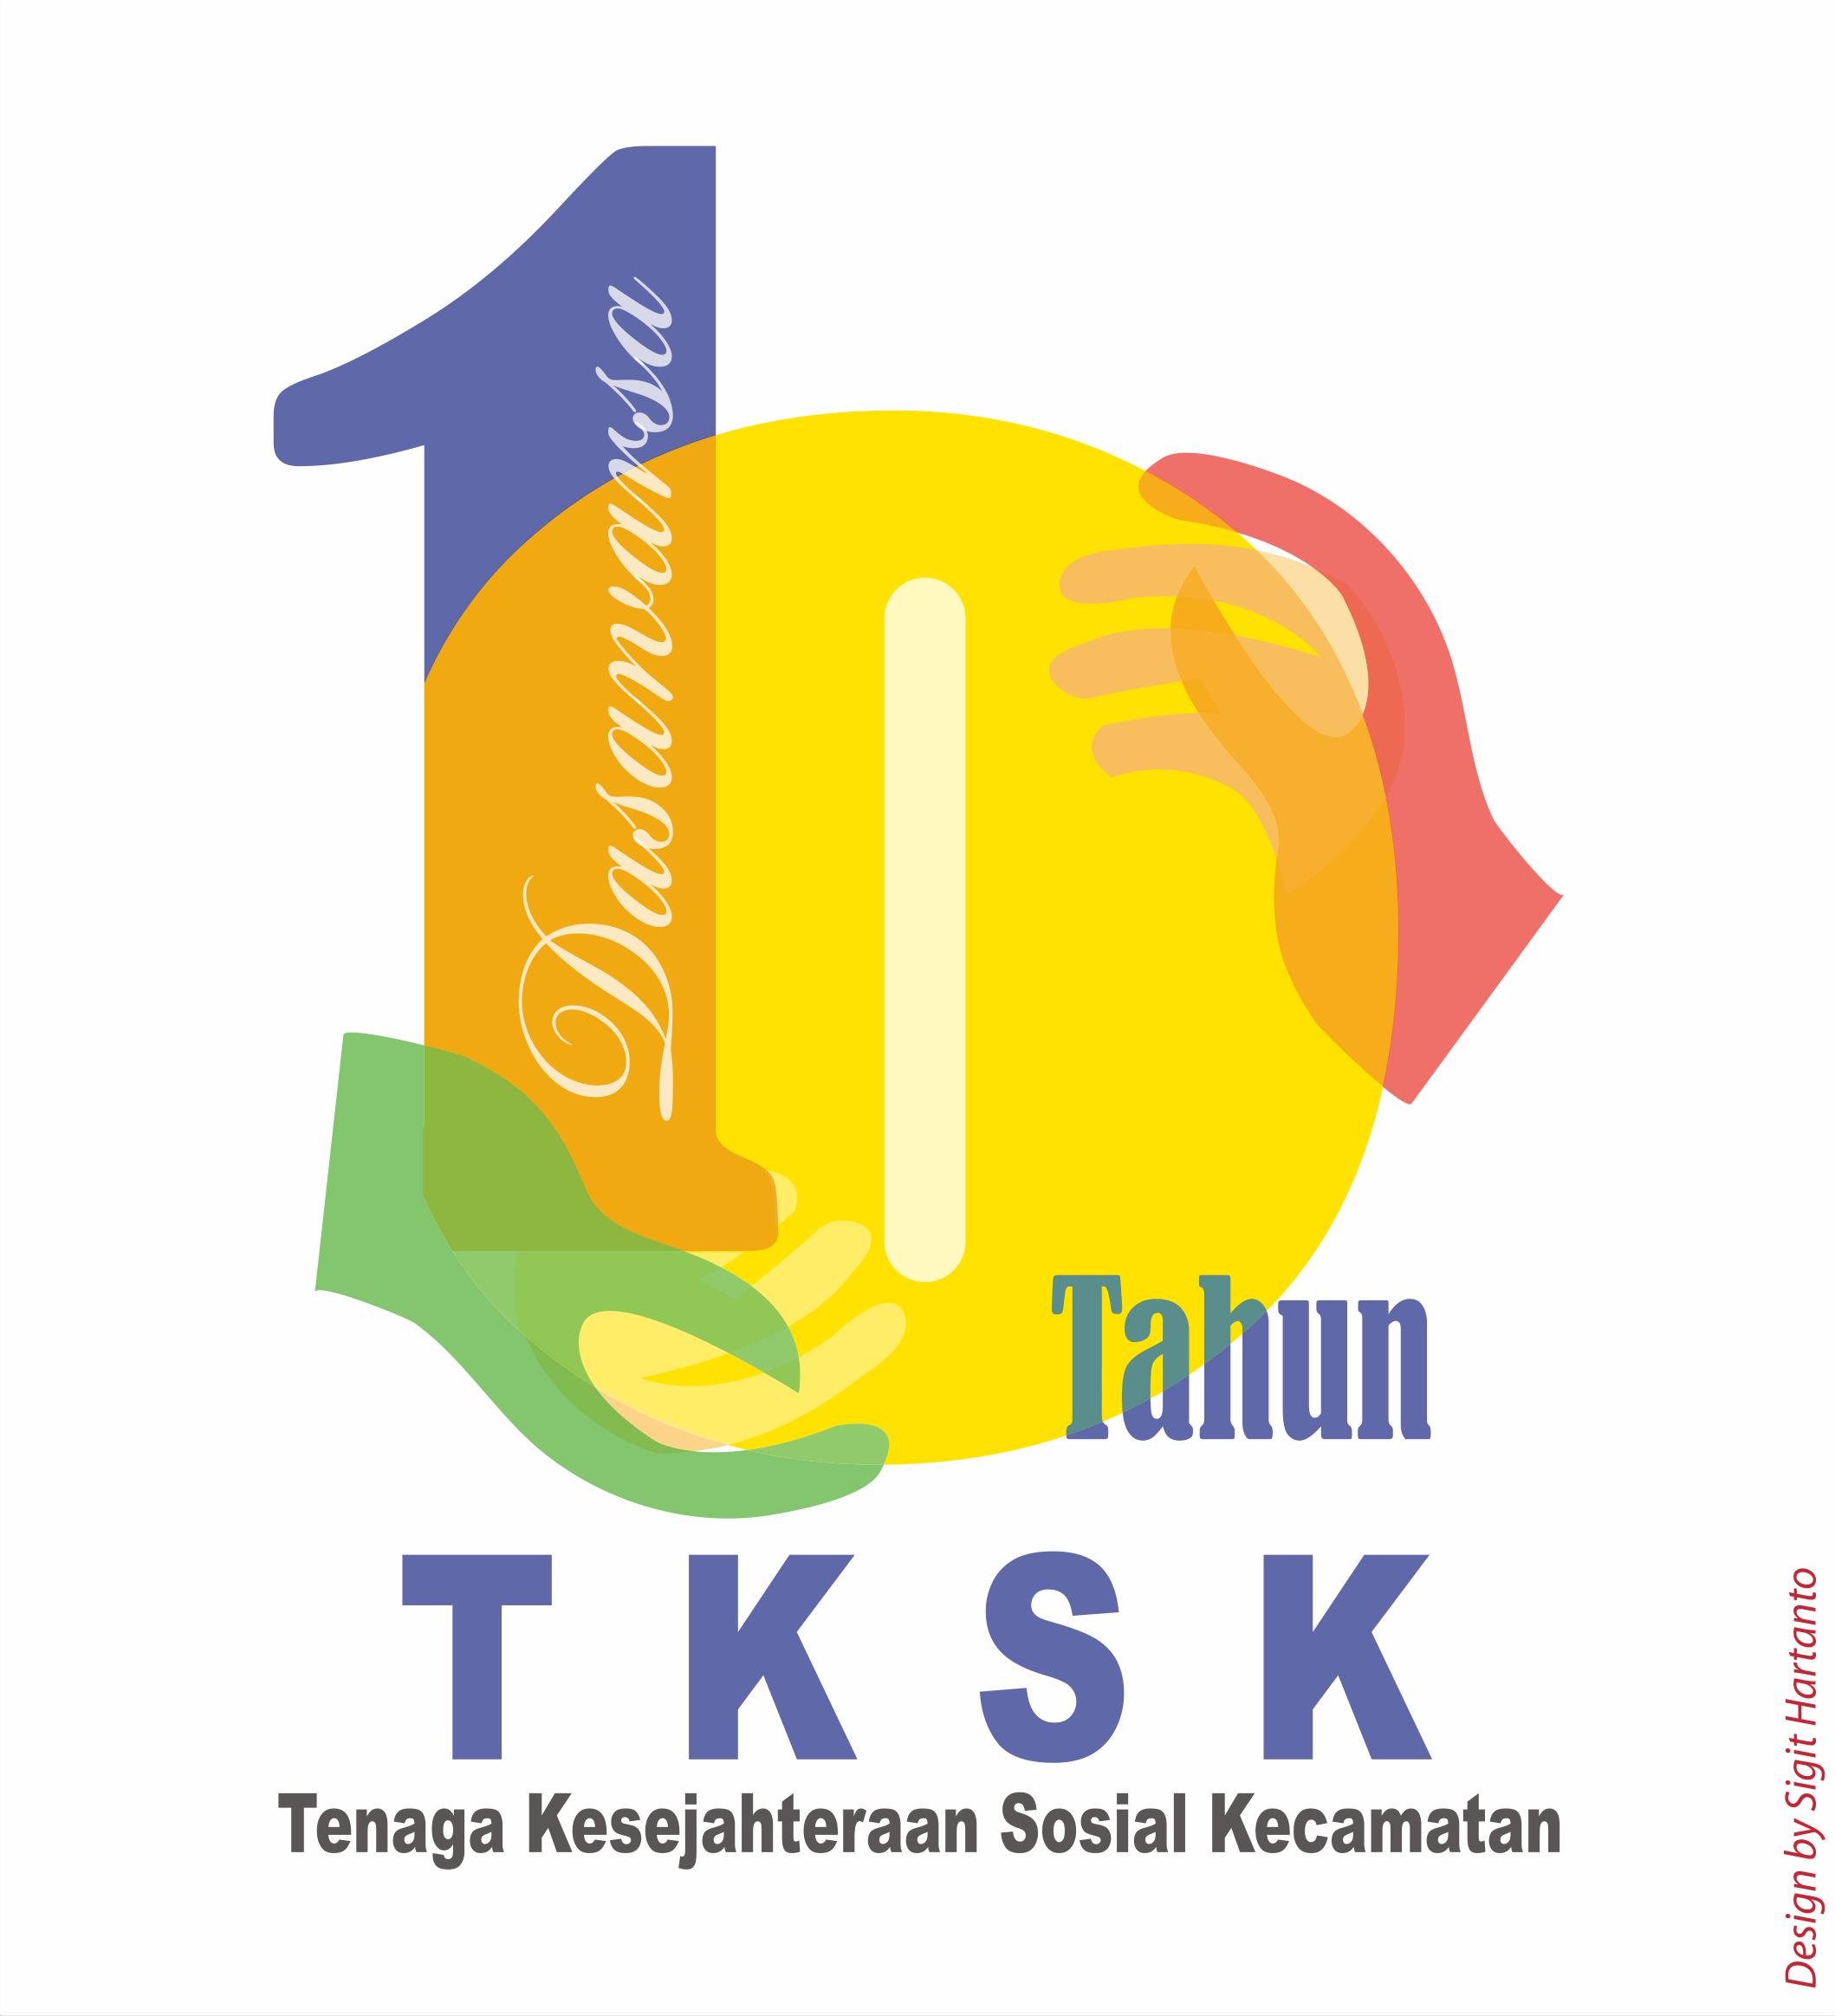 Logo 1 Dasawarsa TKSK